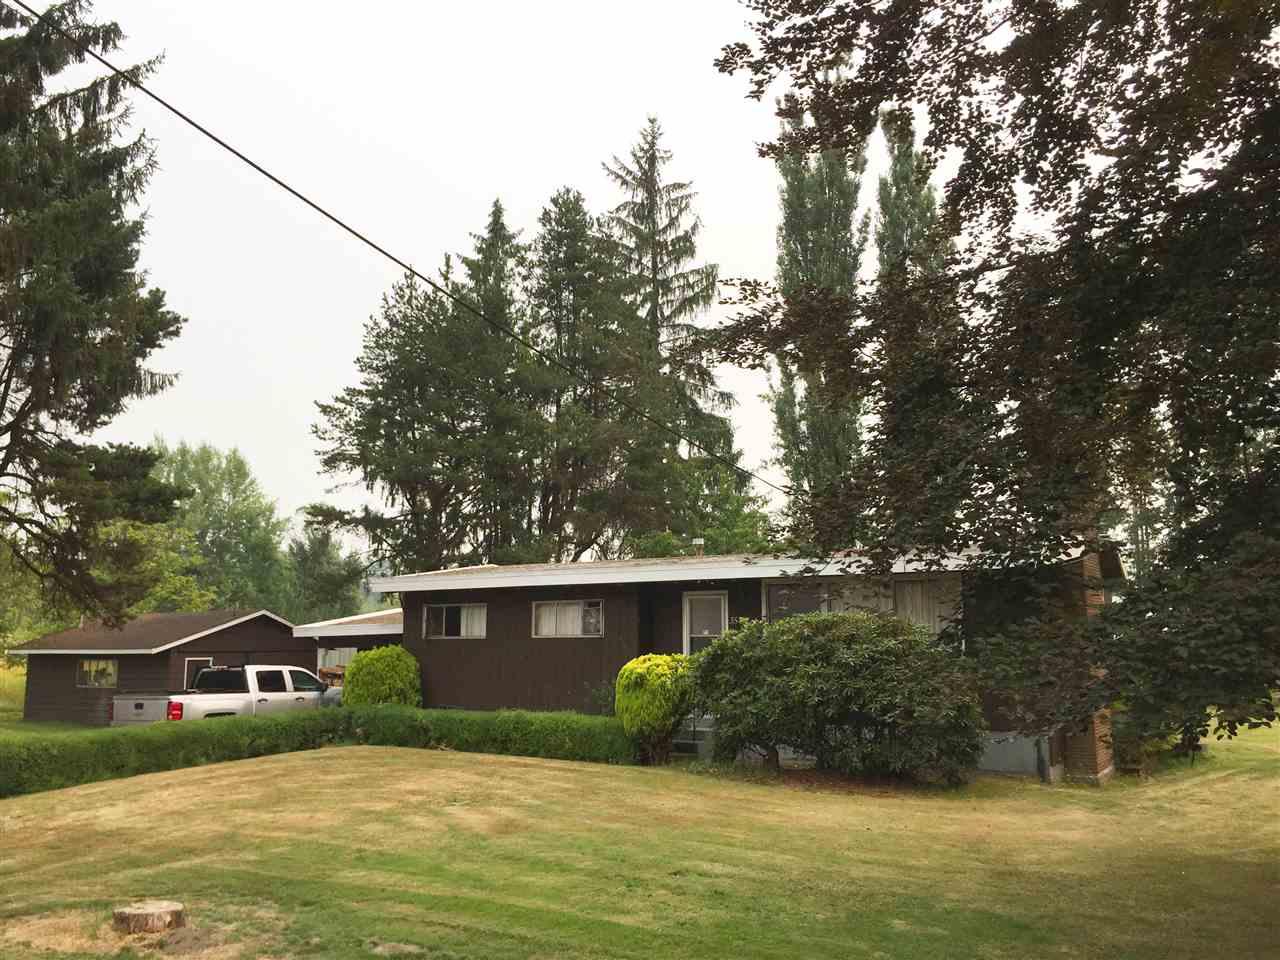 Detached at 3534 264 STREET, Langley, British Columbia. Image 1